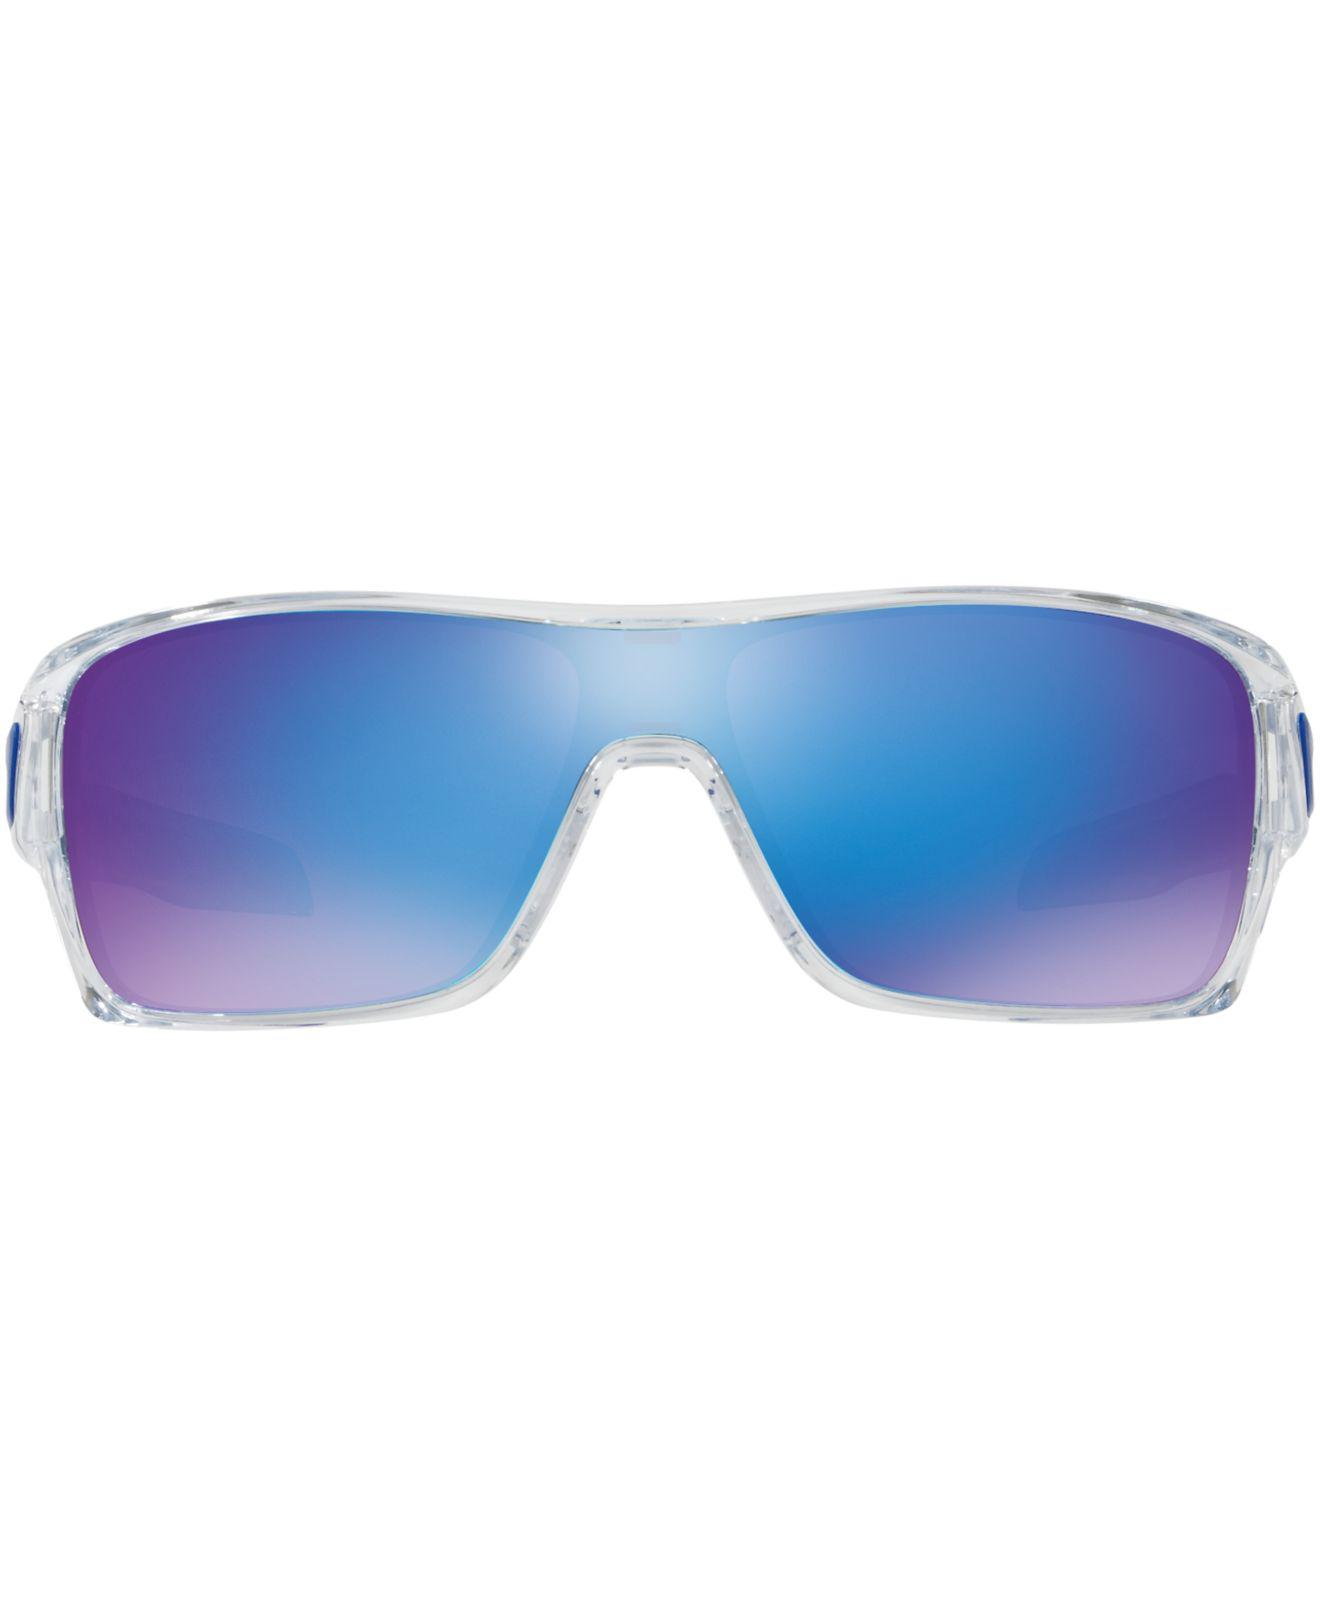 3b79a1c2e5 Lyst - Oakley Turbine Rotor Sunglasses